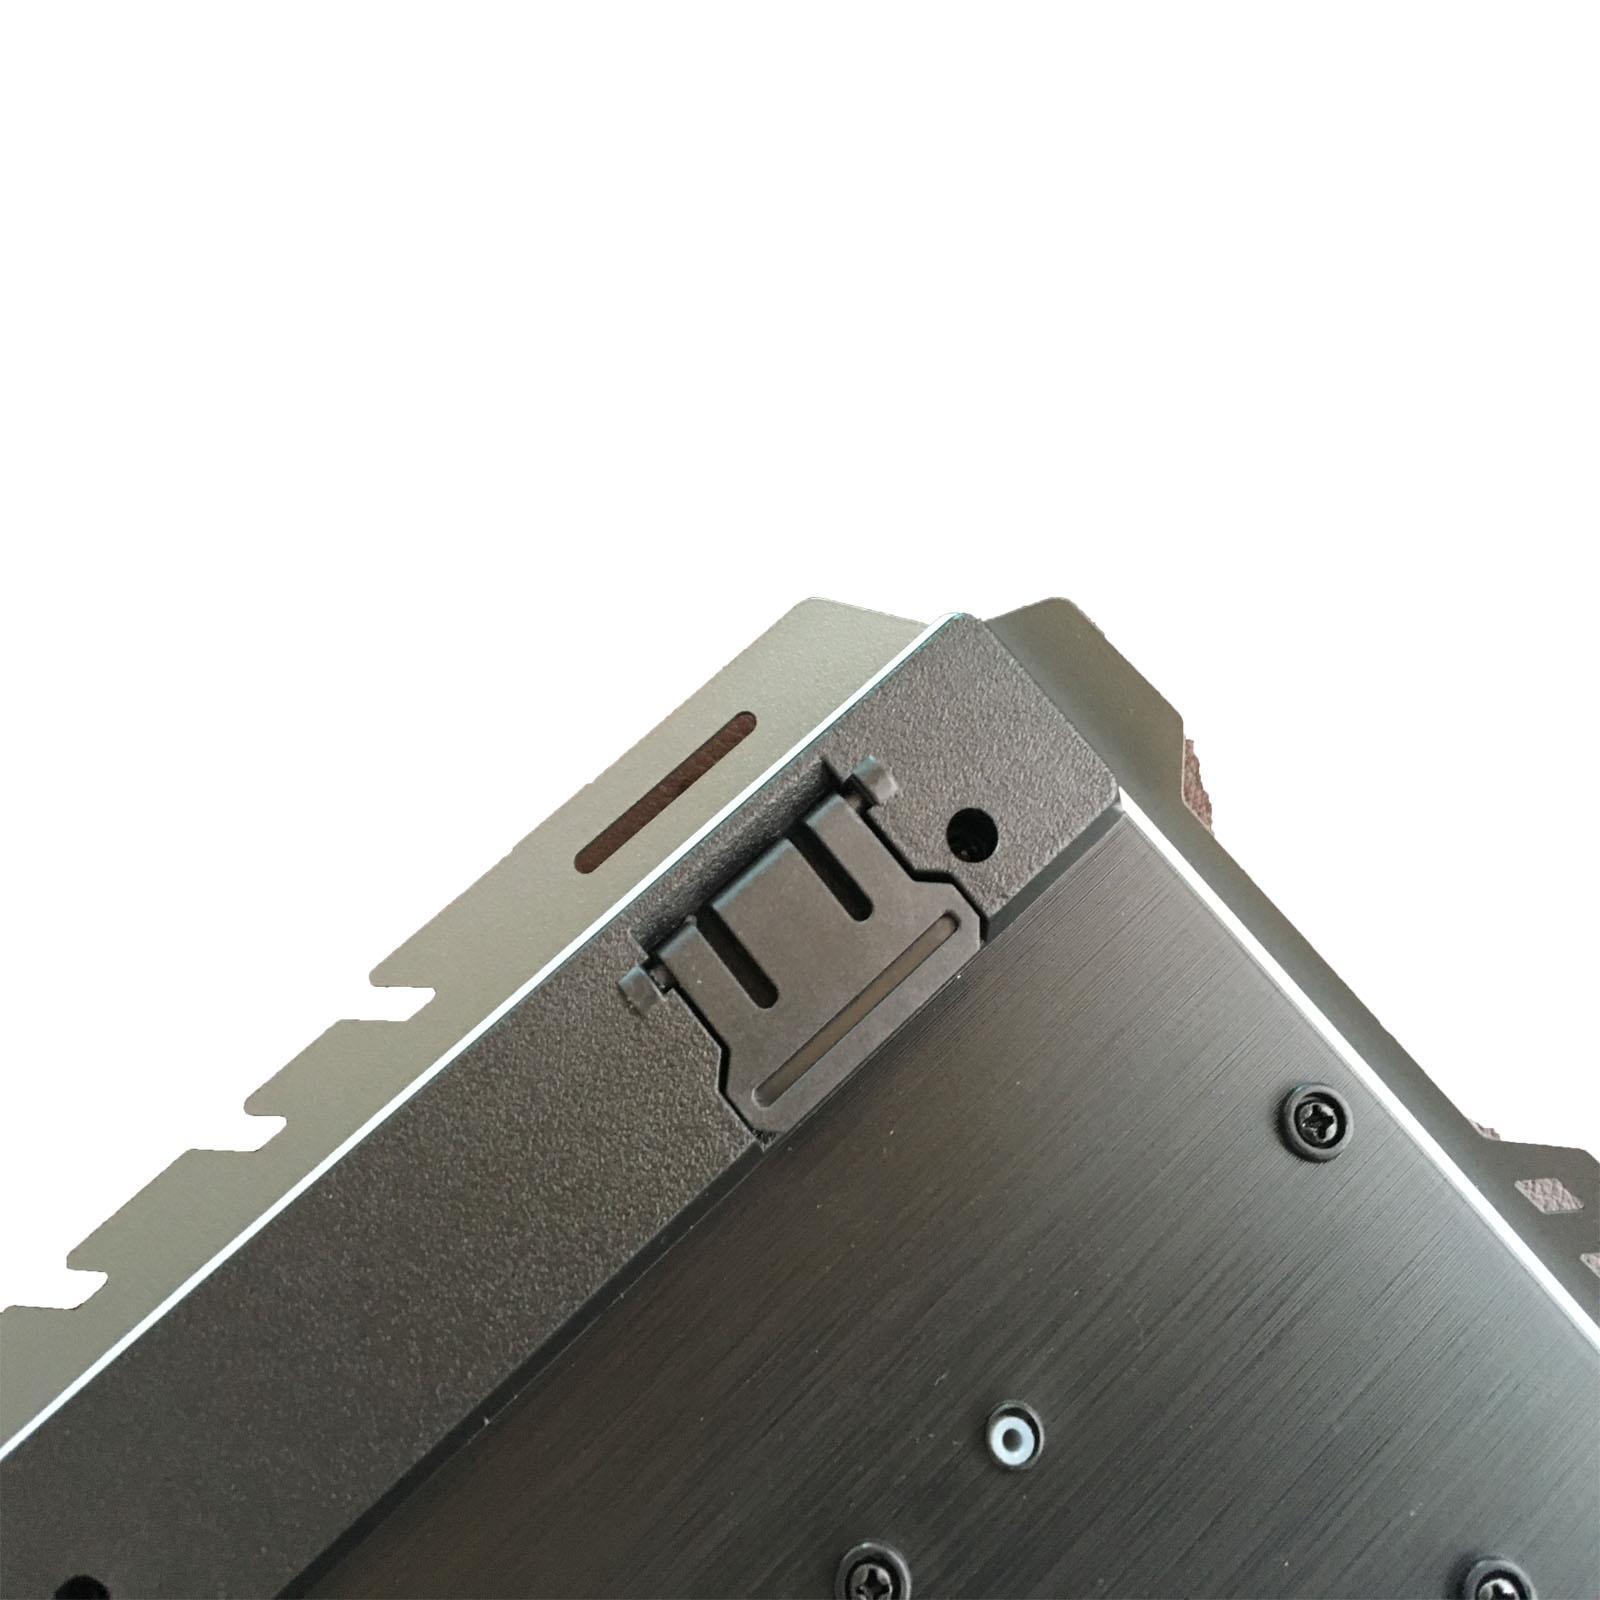 Gaming-Keyboard-Mouse-Backlit-Rainbow-LED-USB-Set-for-PC-Laptop-PS4-Xbox-One thumbnail 35